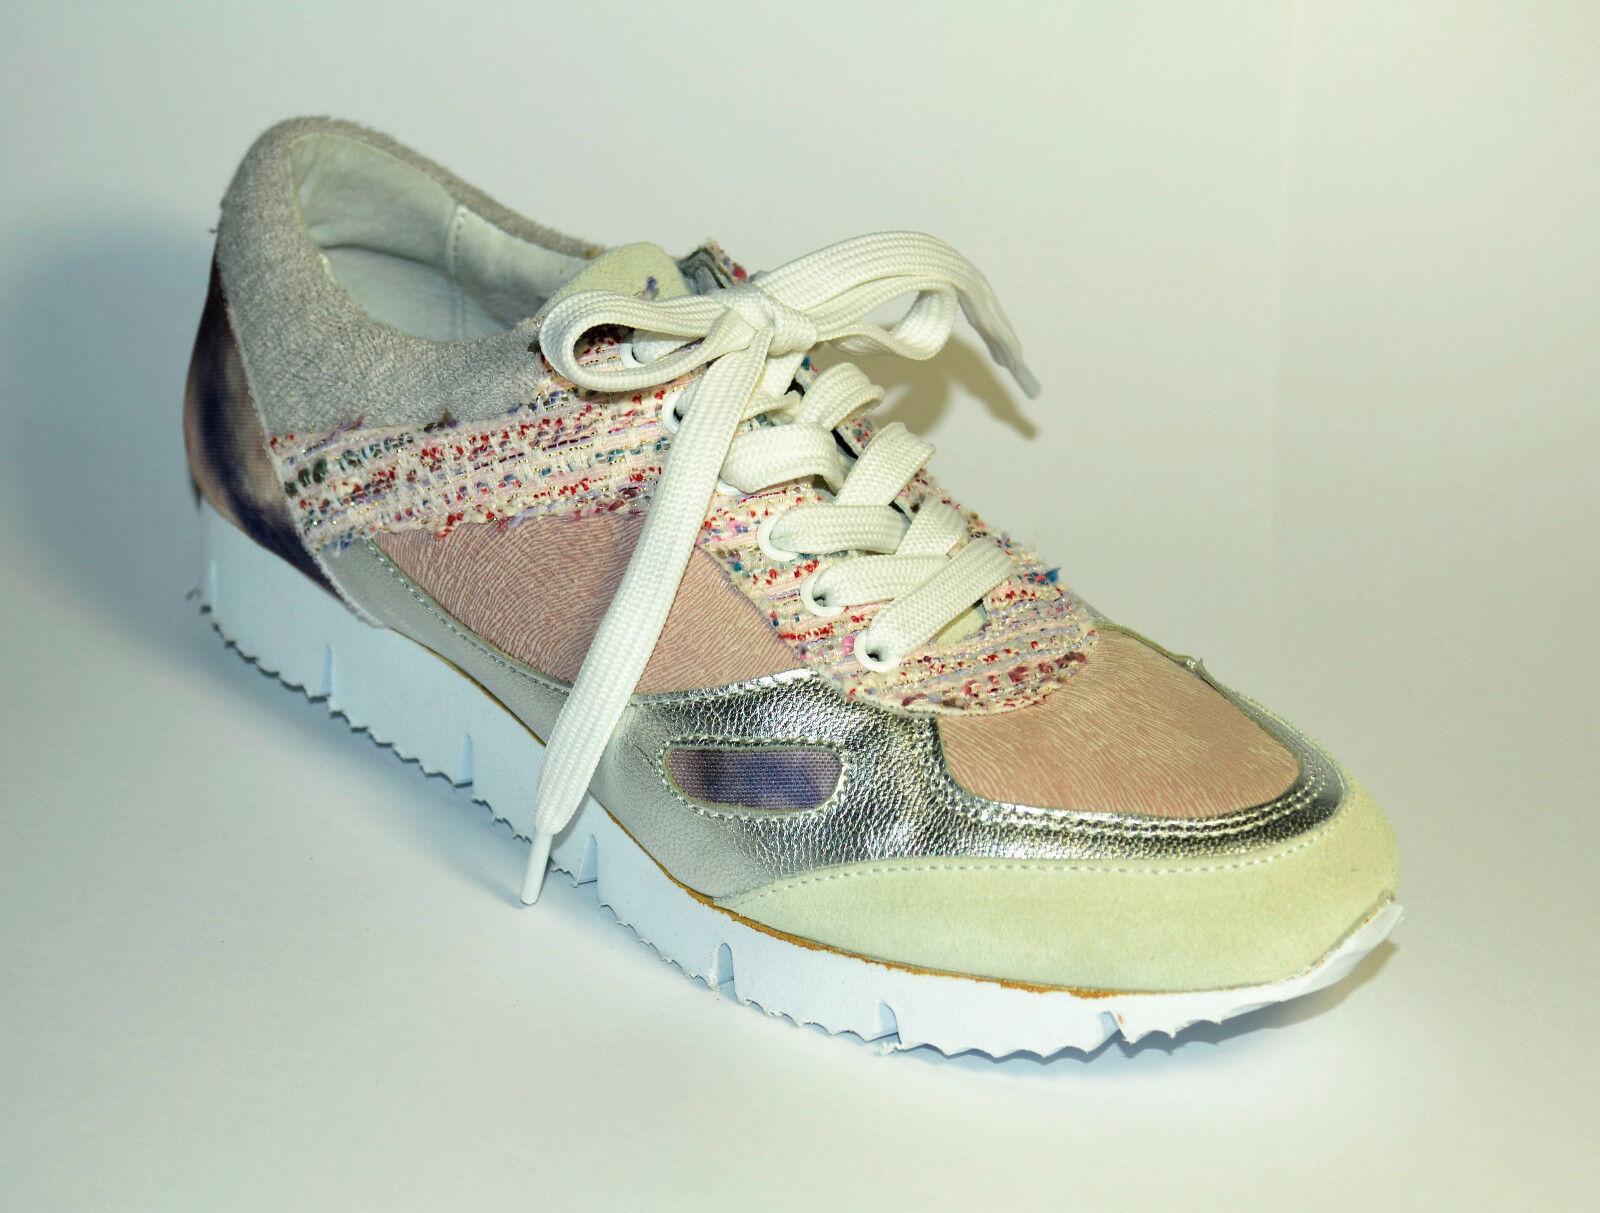 Piazza Donna Scarpe Sneaker Tg. 38 (PE 1912/s)